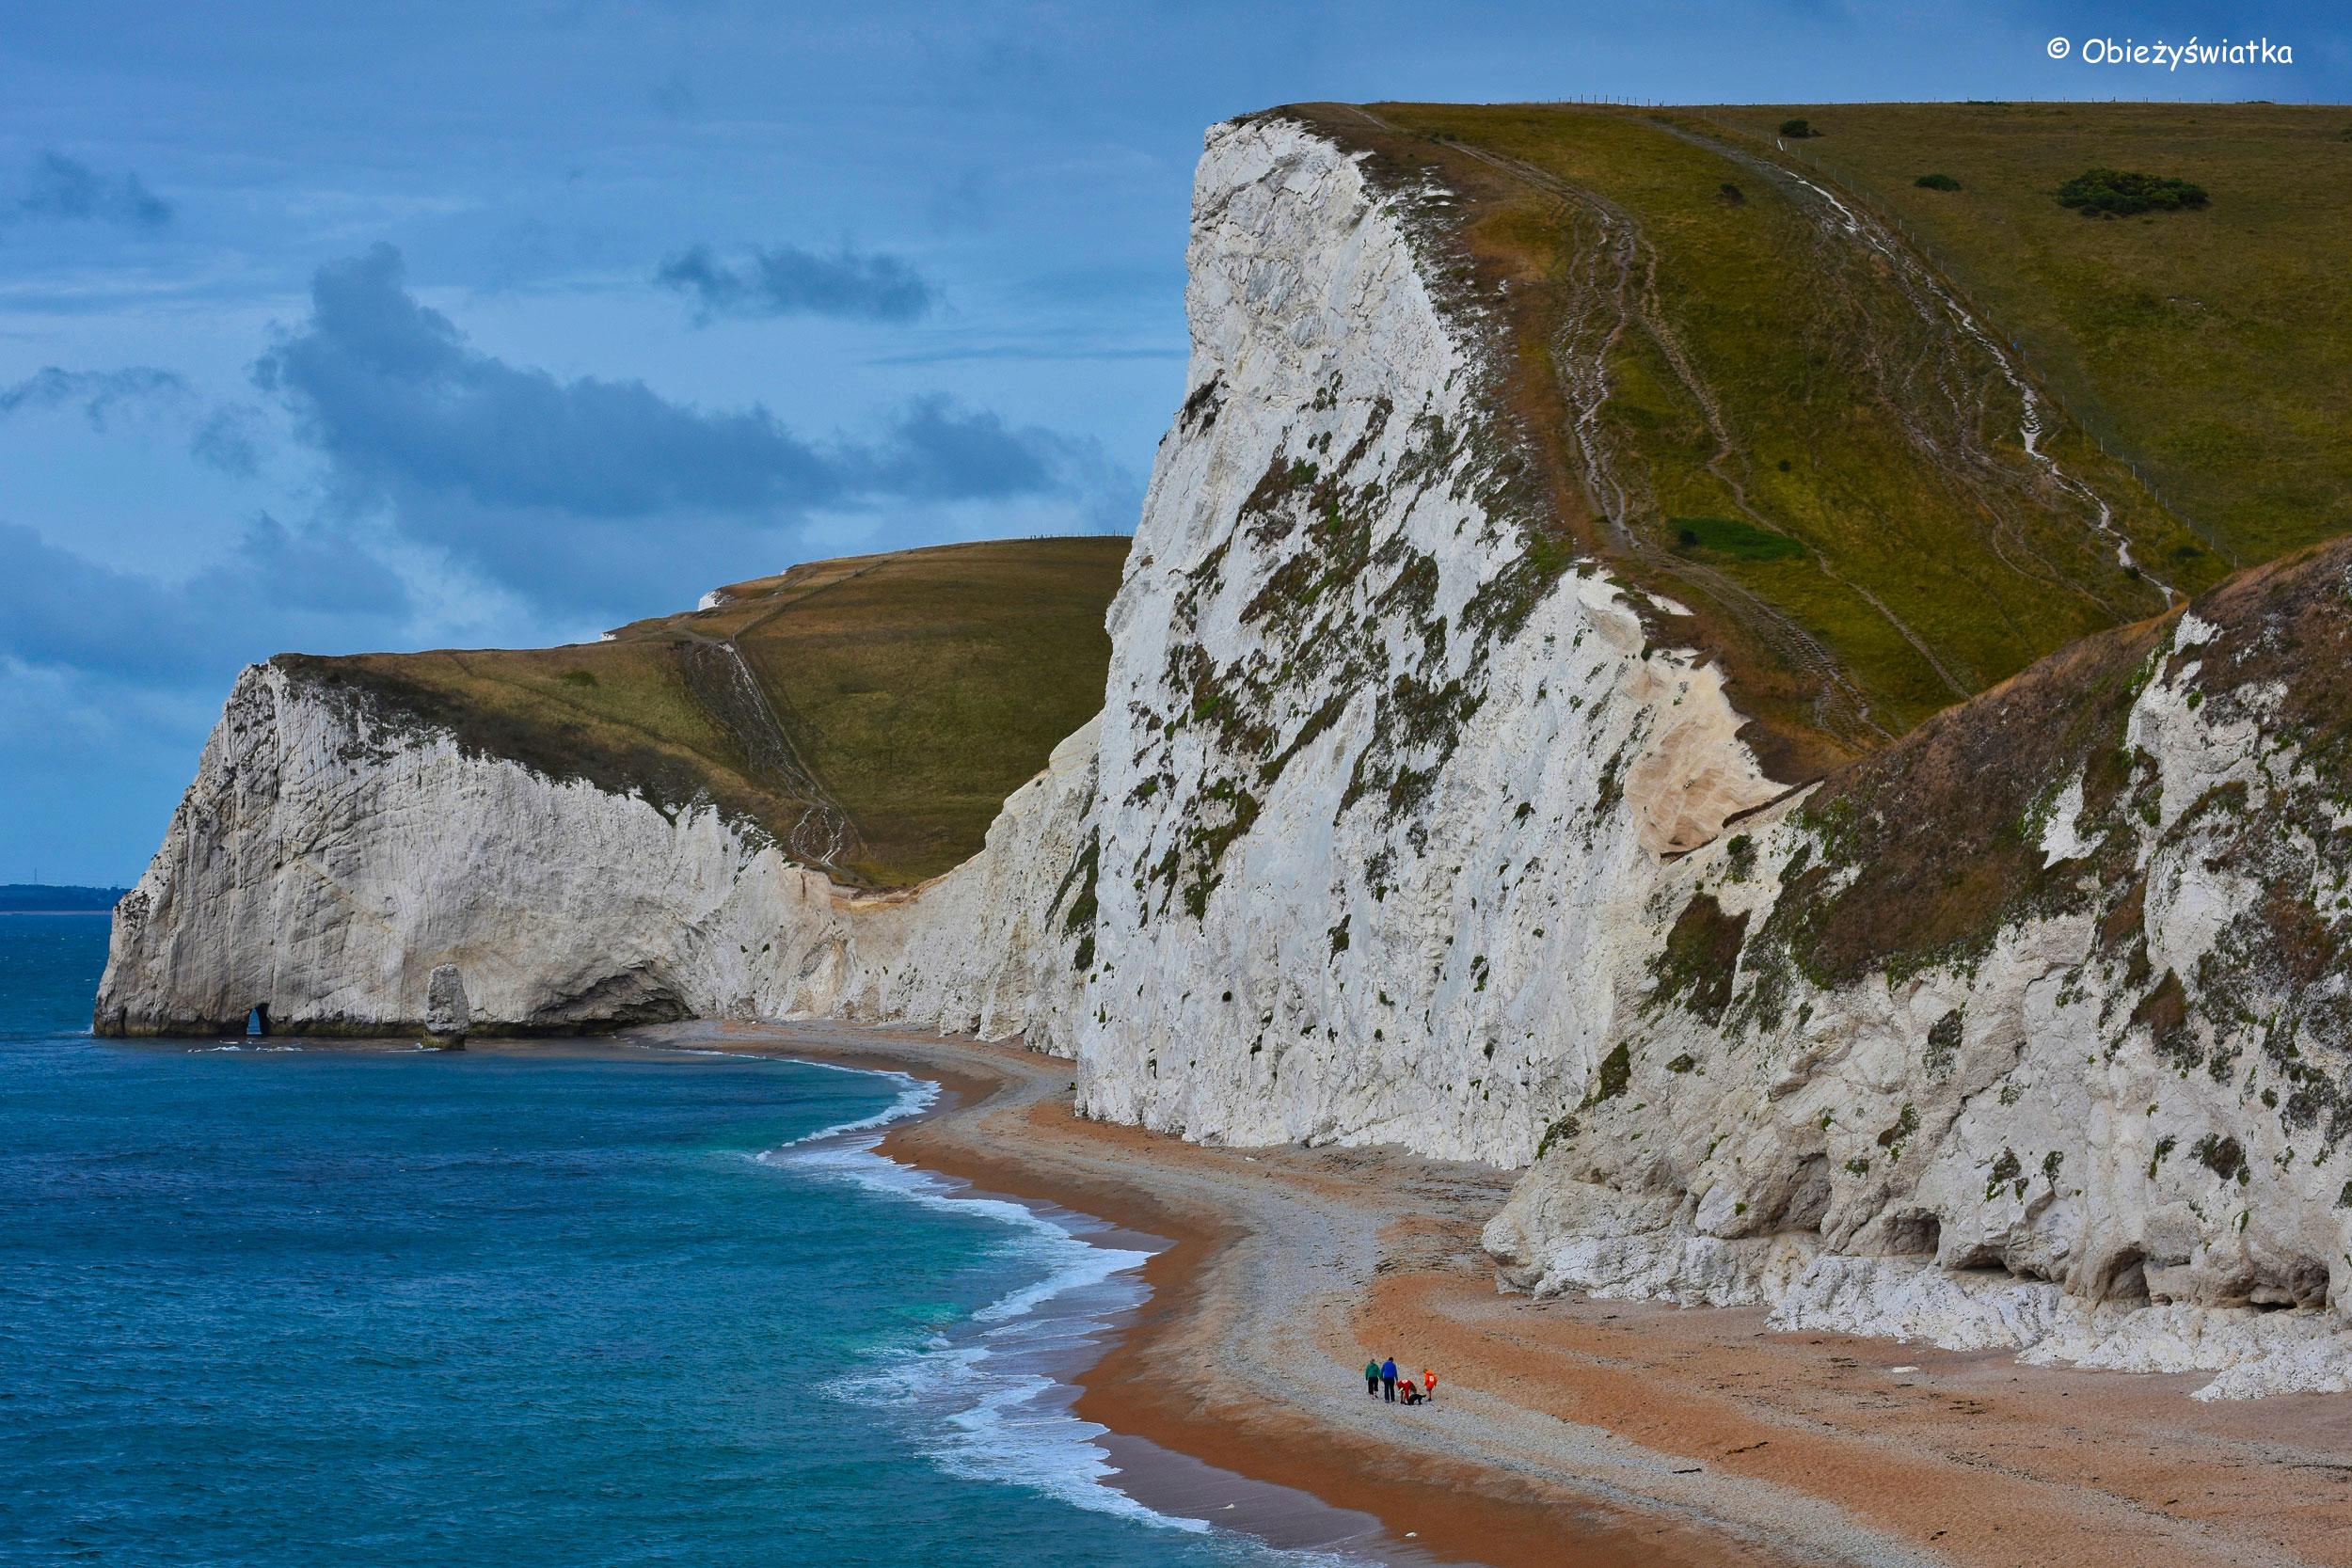 Durdle Door - białe klify, błękitne morze...